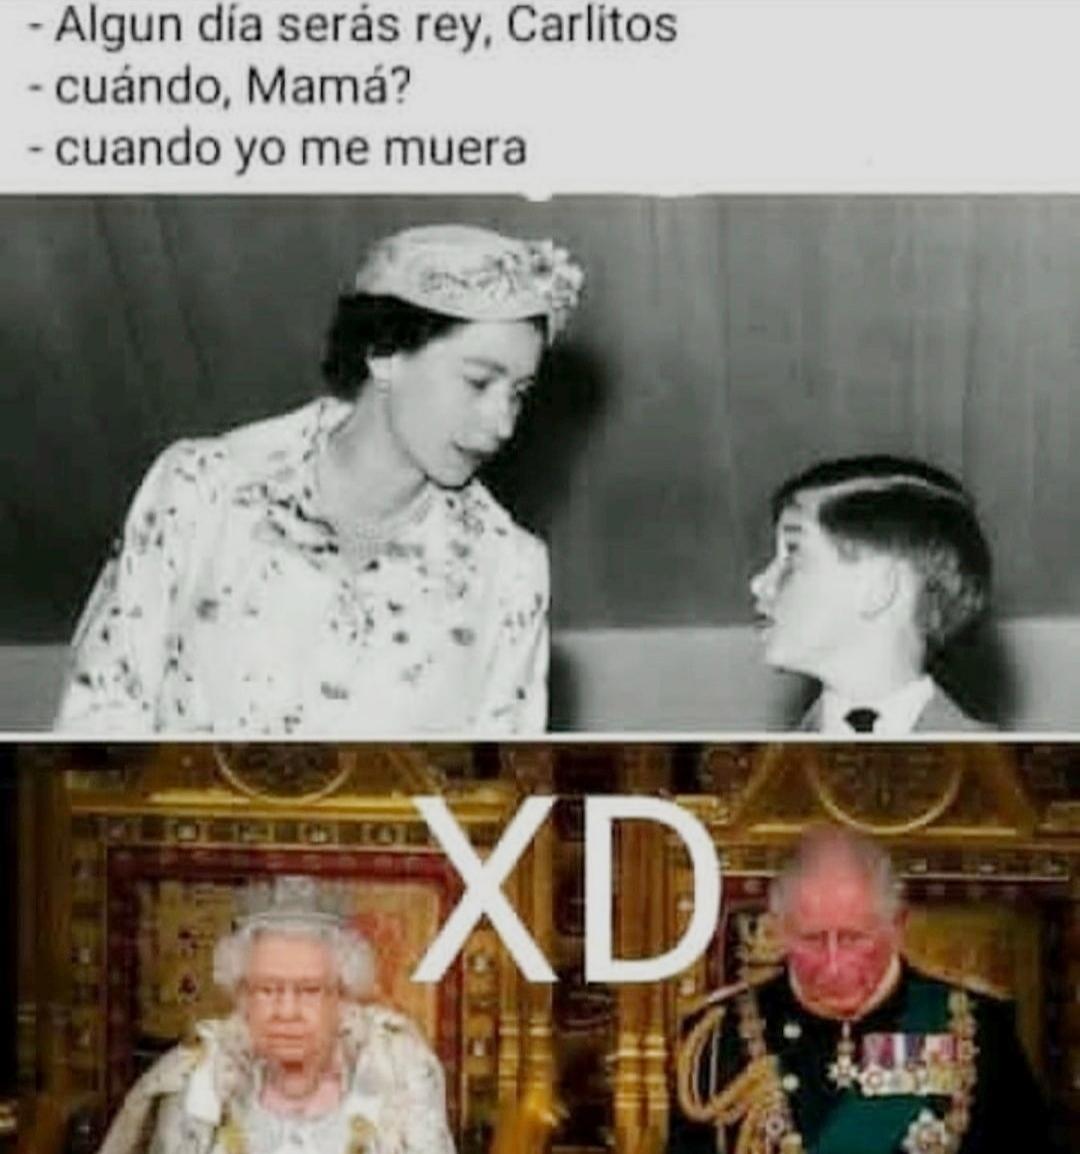 Es inmortal xdd - meme